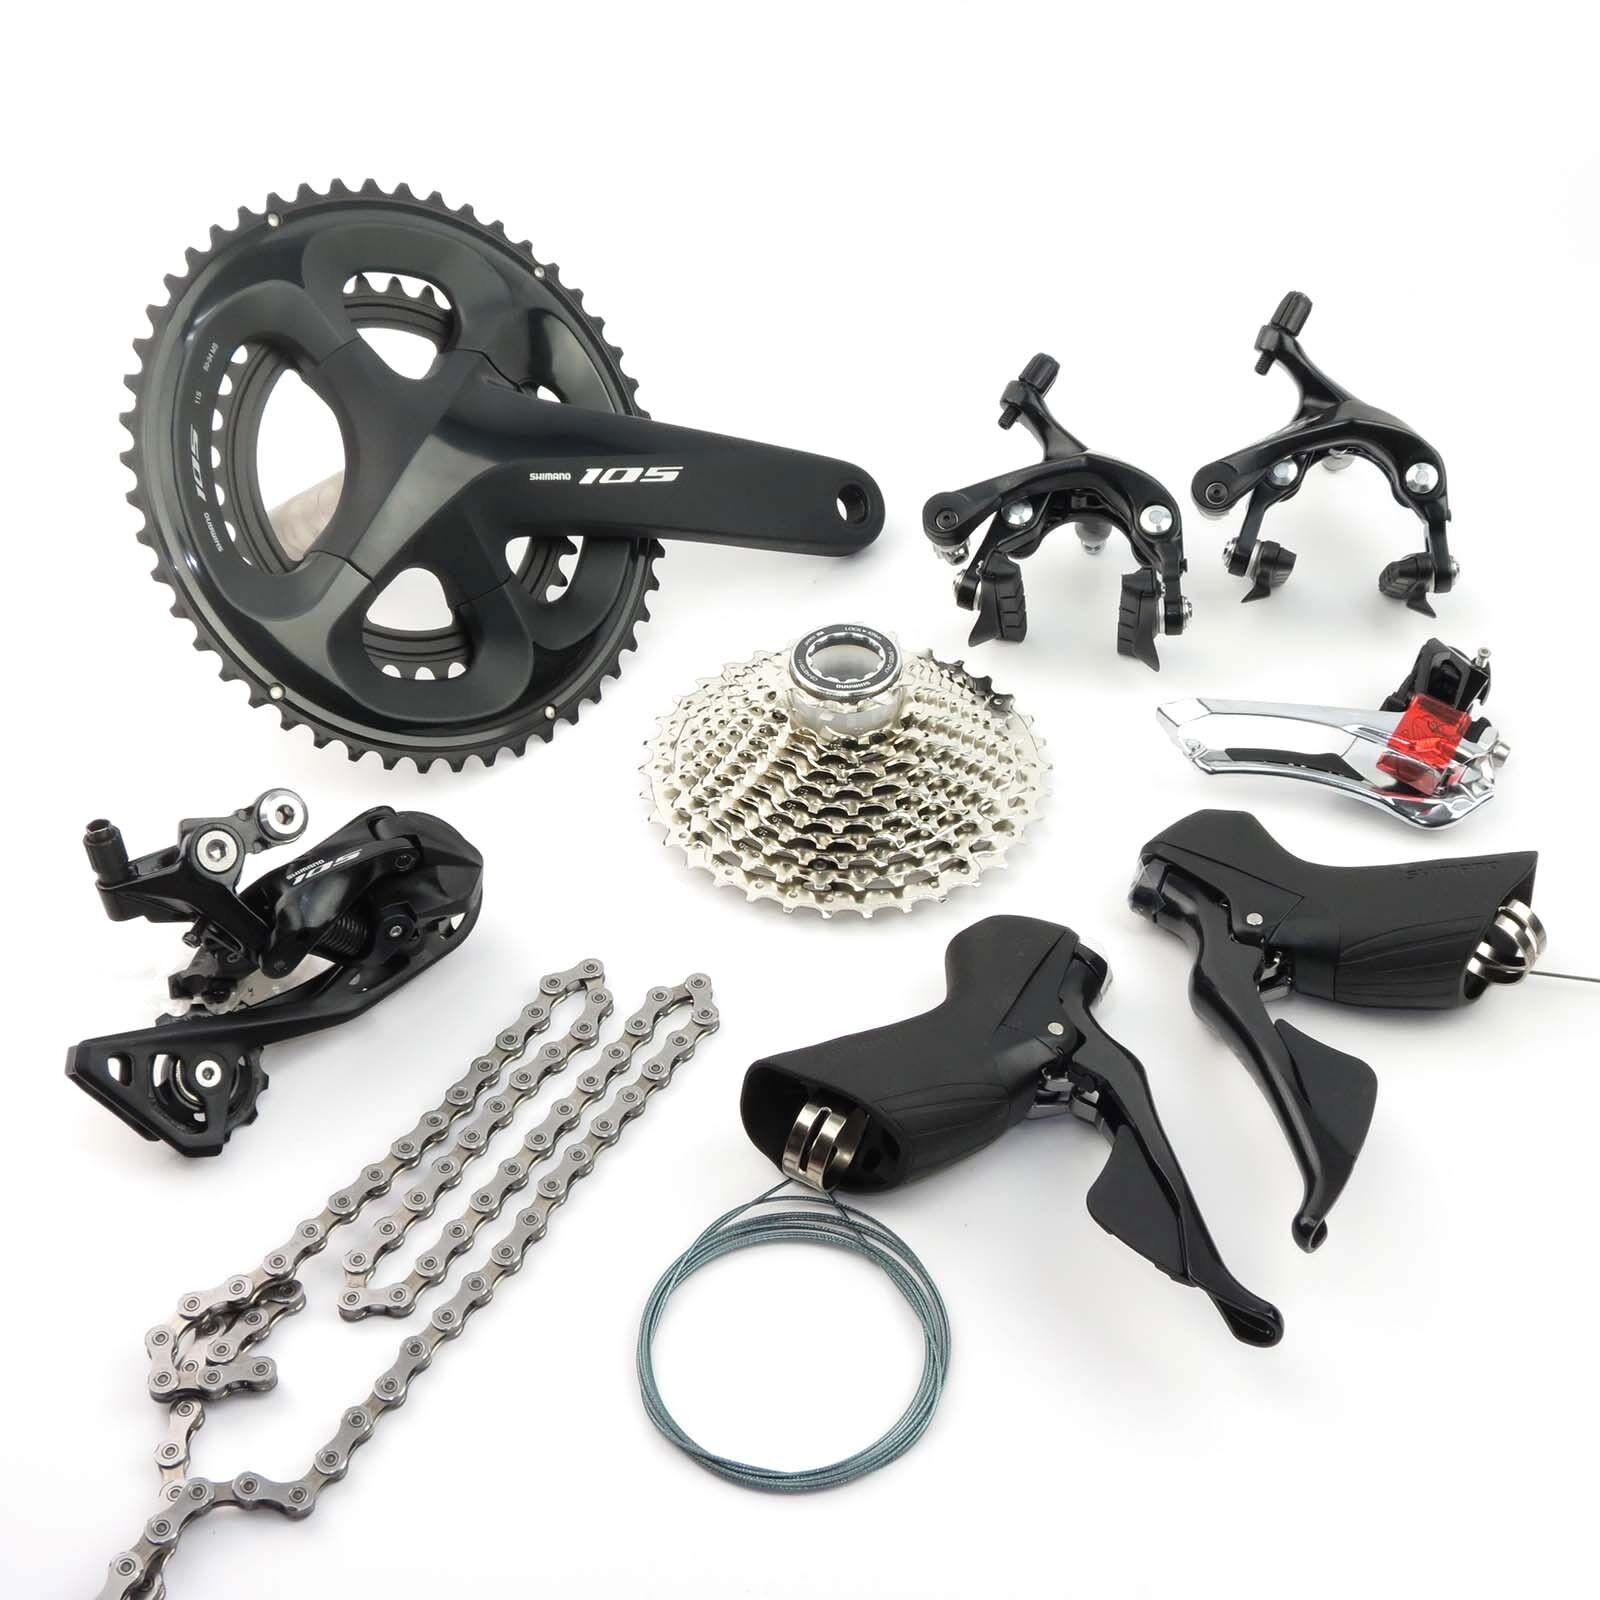 Shimano 105 R7000 2 x 11 speed 52-36T Road Bike Bicycle Groupset Build kit